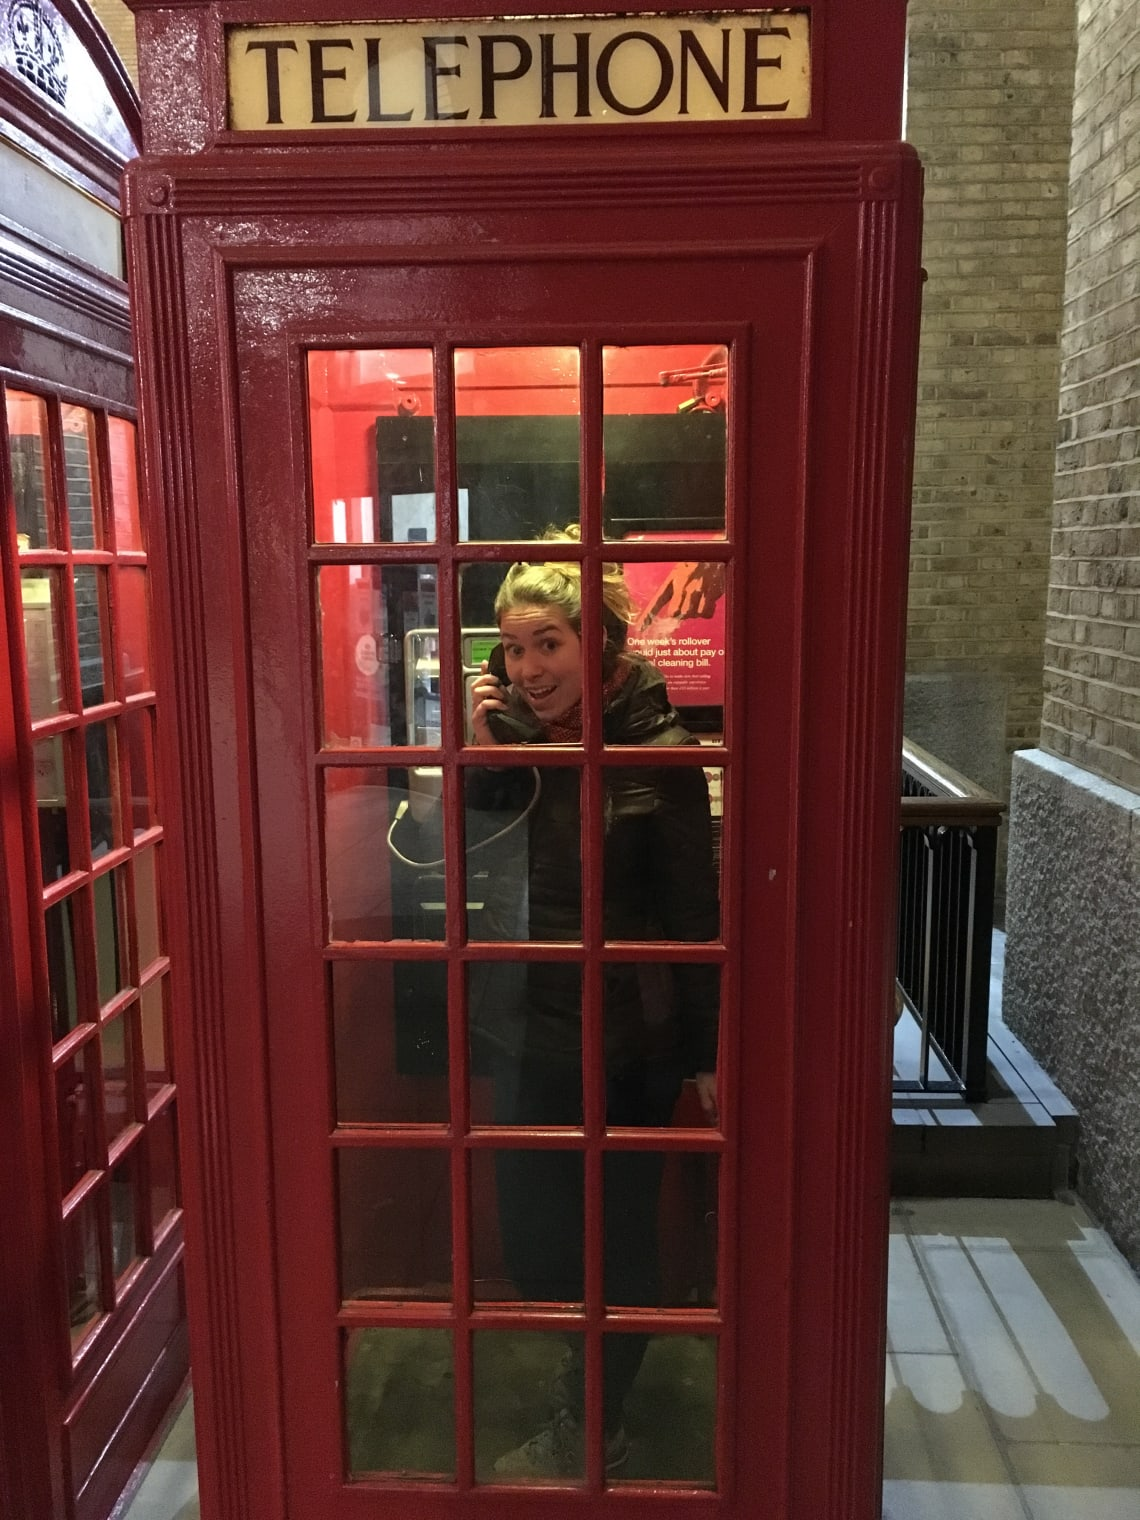 12 lugares que no debes perderte en Londres - Worldpackers - cabina telefonica roja en londres